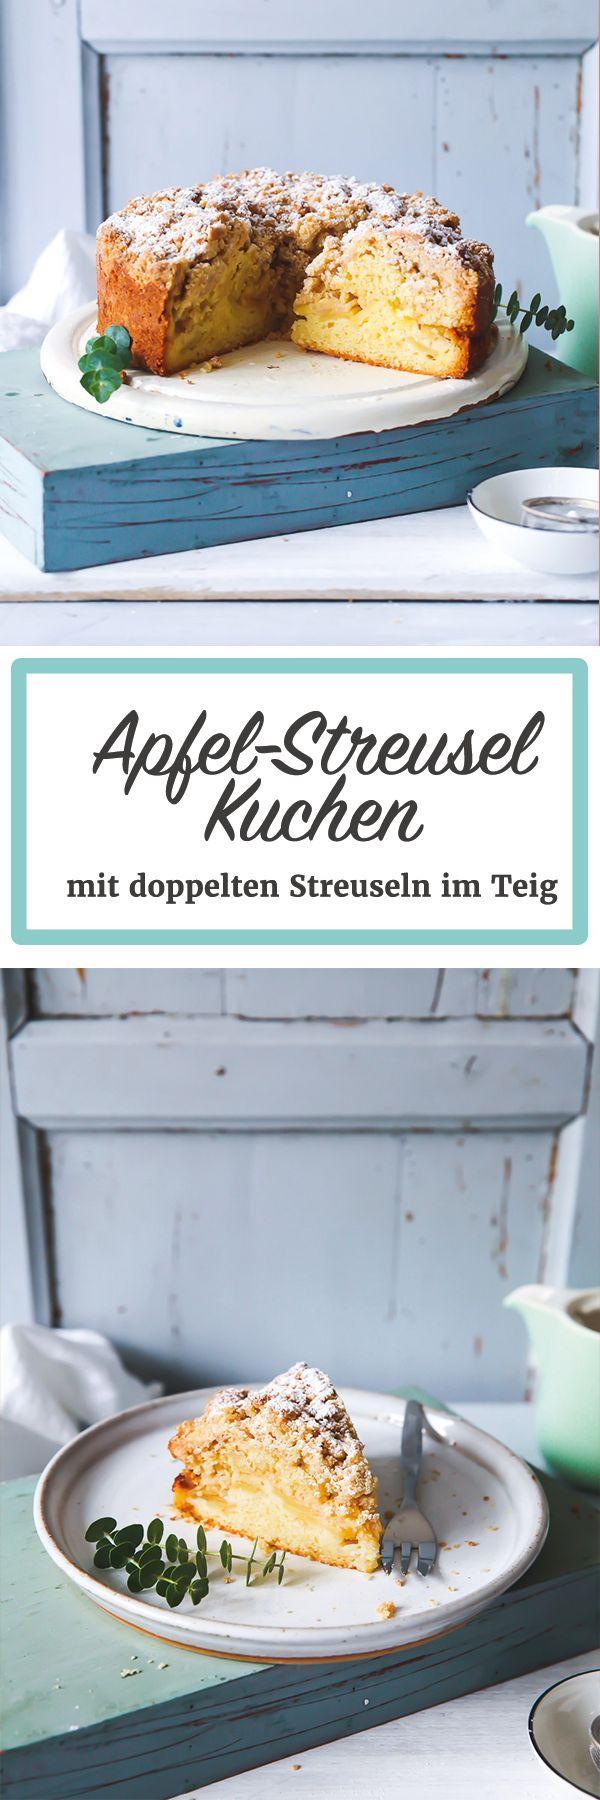 Apfel Streusel Kuchen Rezept mit Streuseln im Teig - double streusel apple cake zuckerzimtundliebe.de